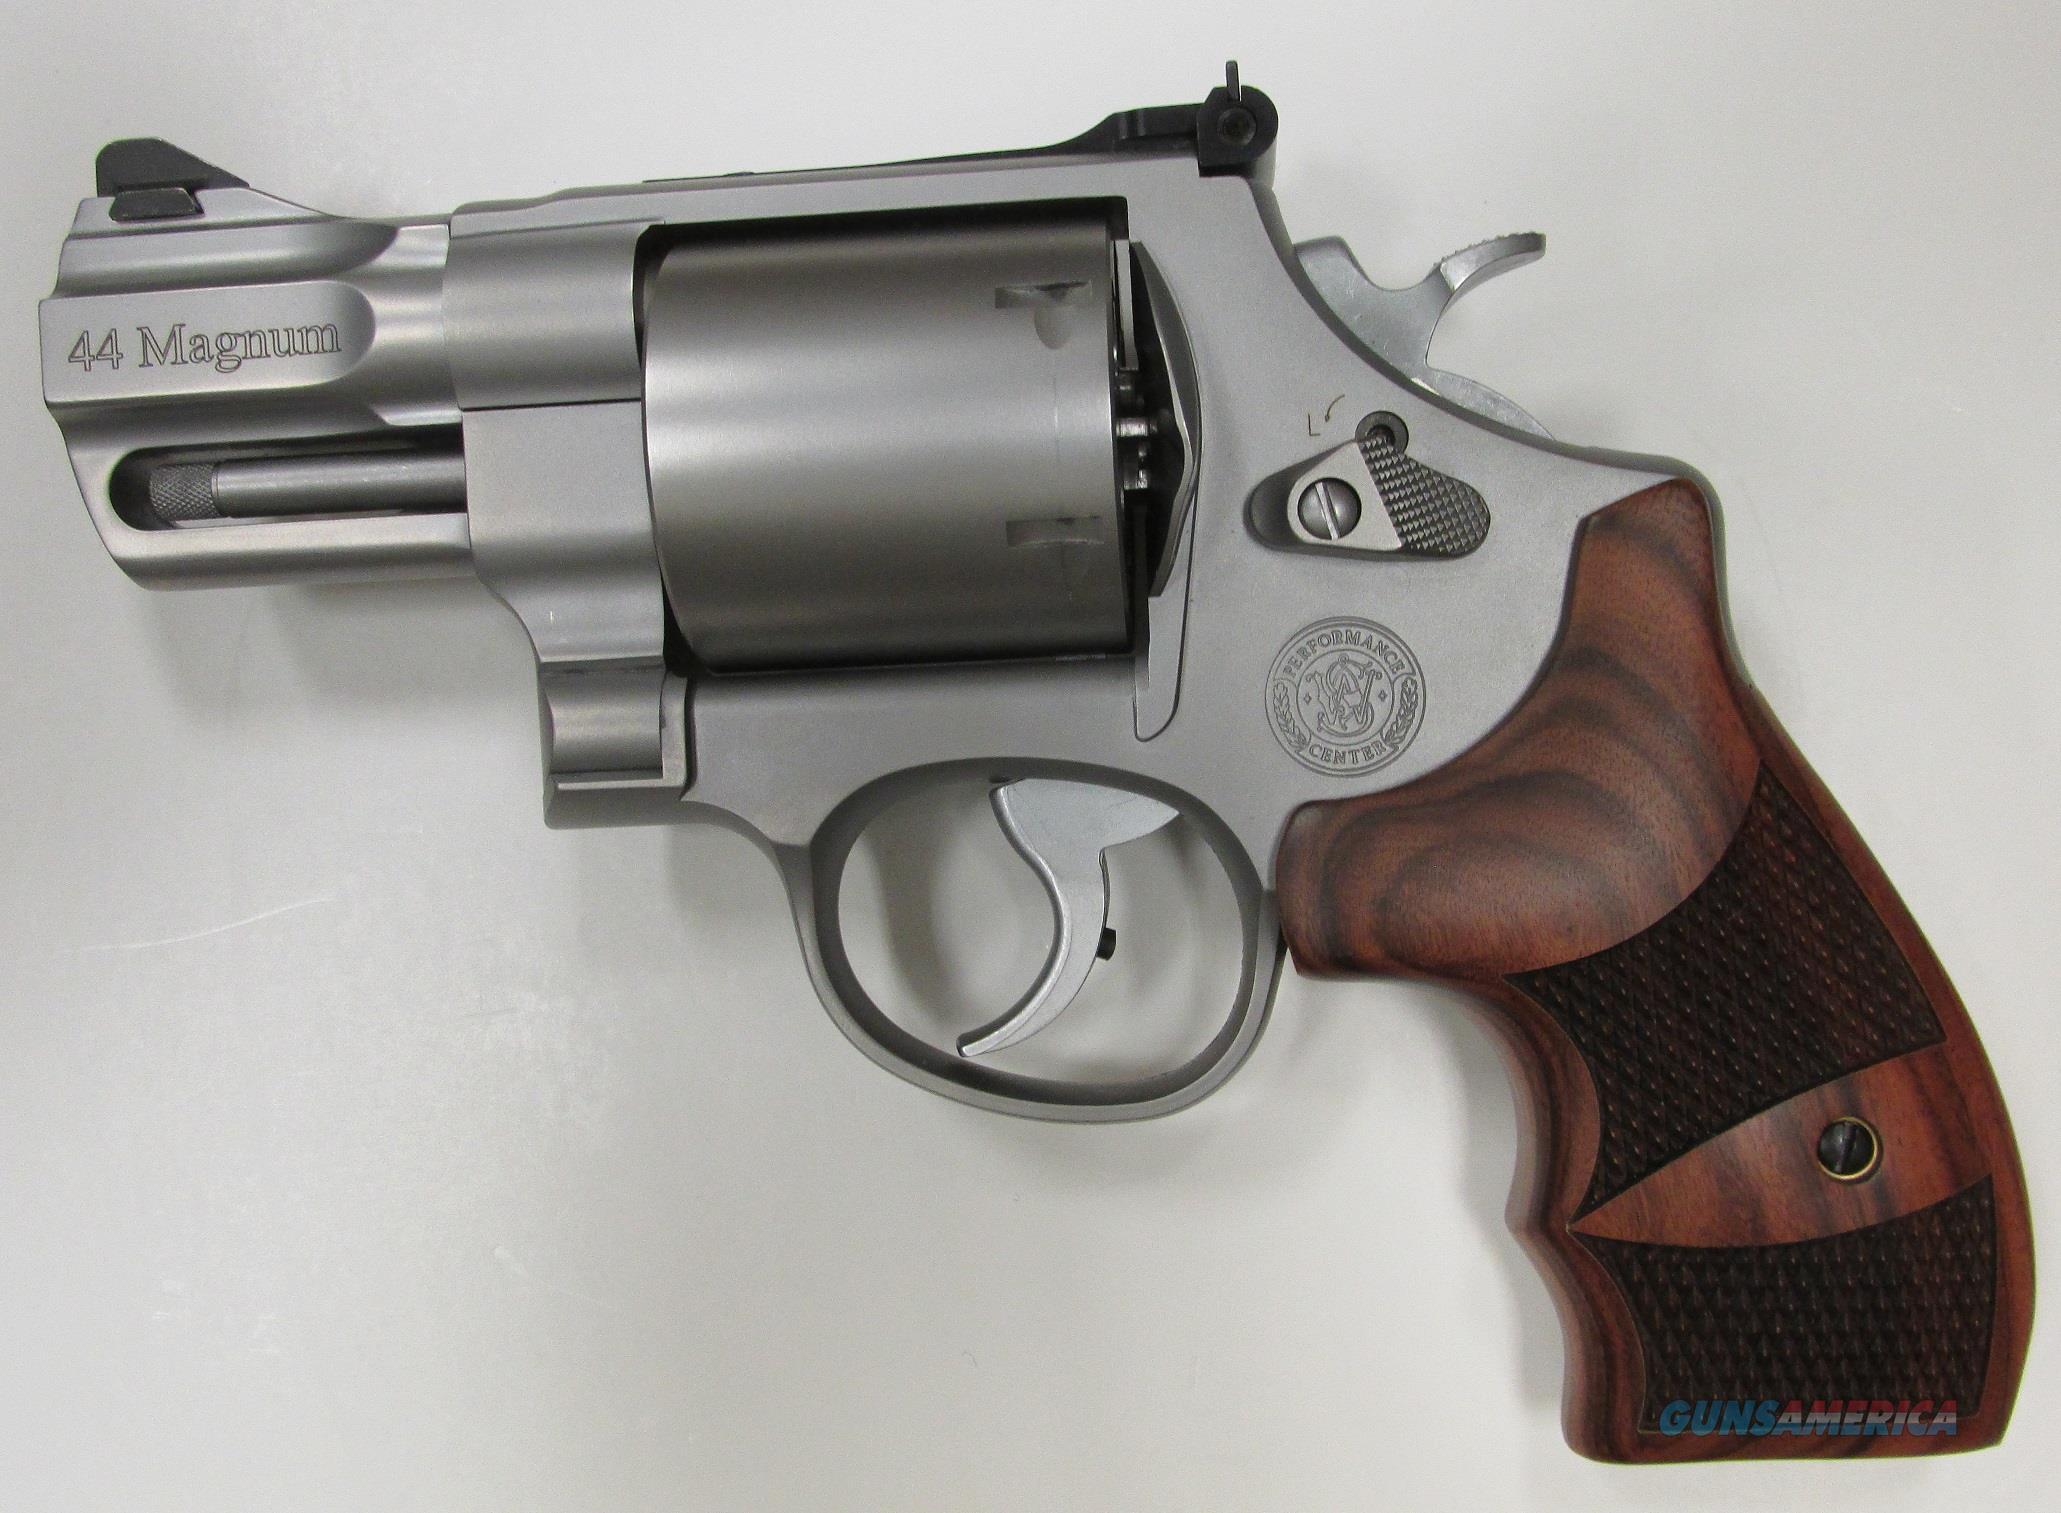 S&W 629 Performance Center 44Mag 170135 Snub44 Magnum Snub Nose Revolver